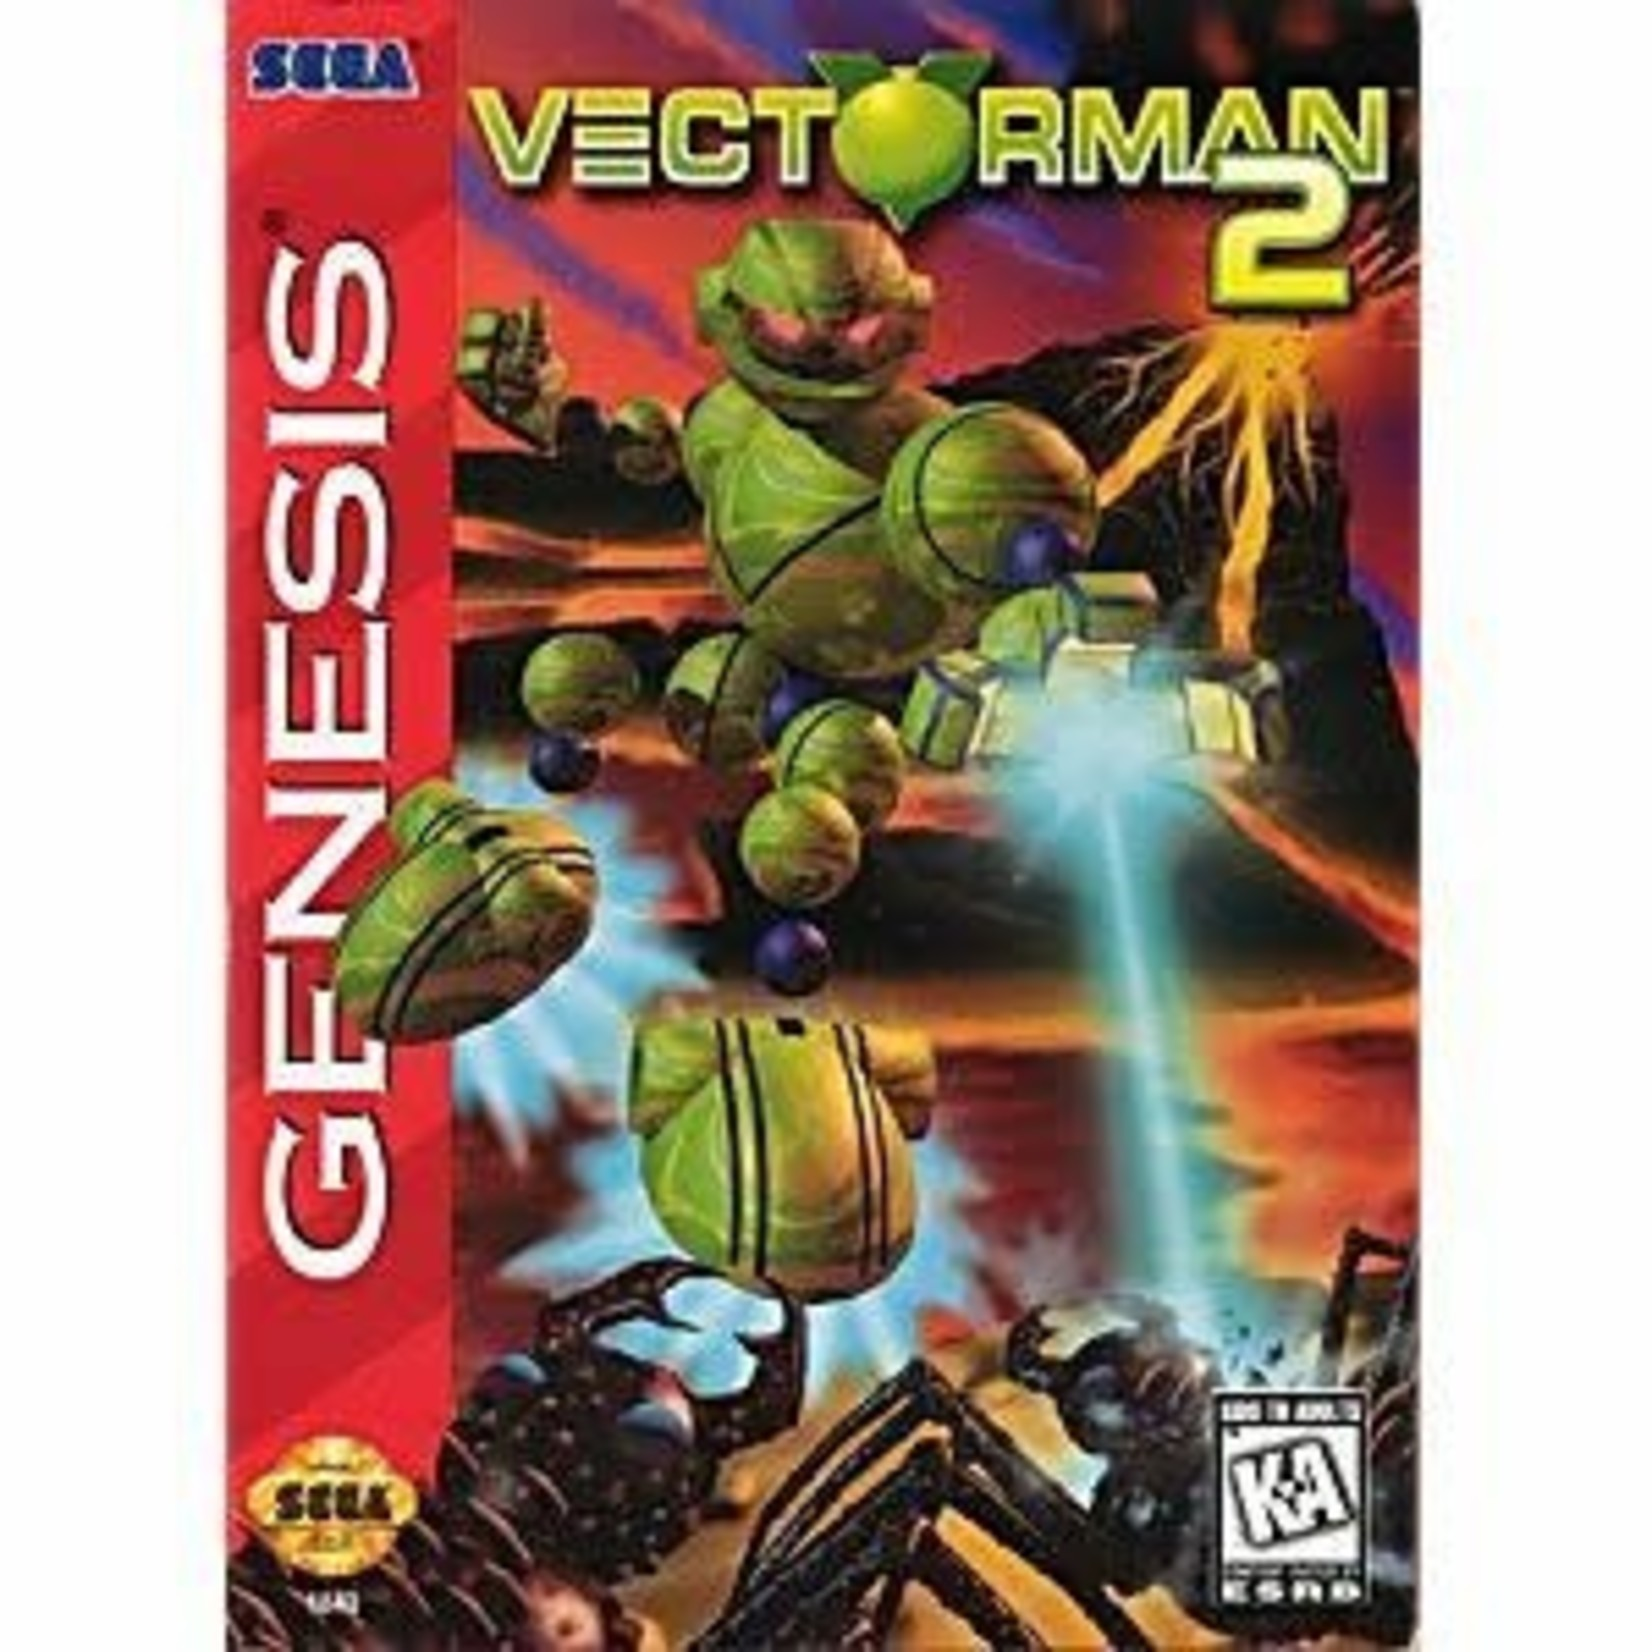 sgu-Vectorman 2 (complete in box)